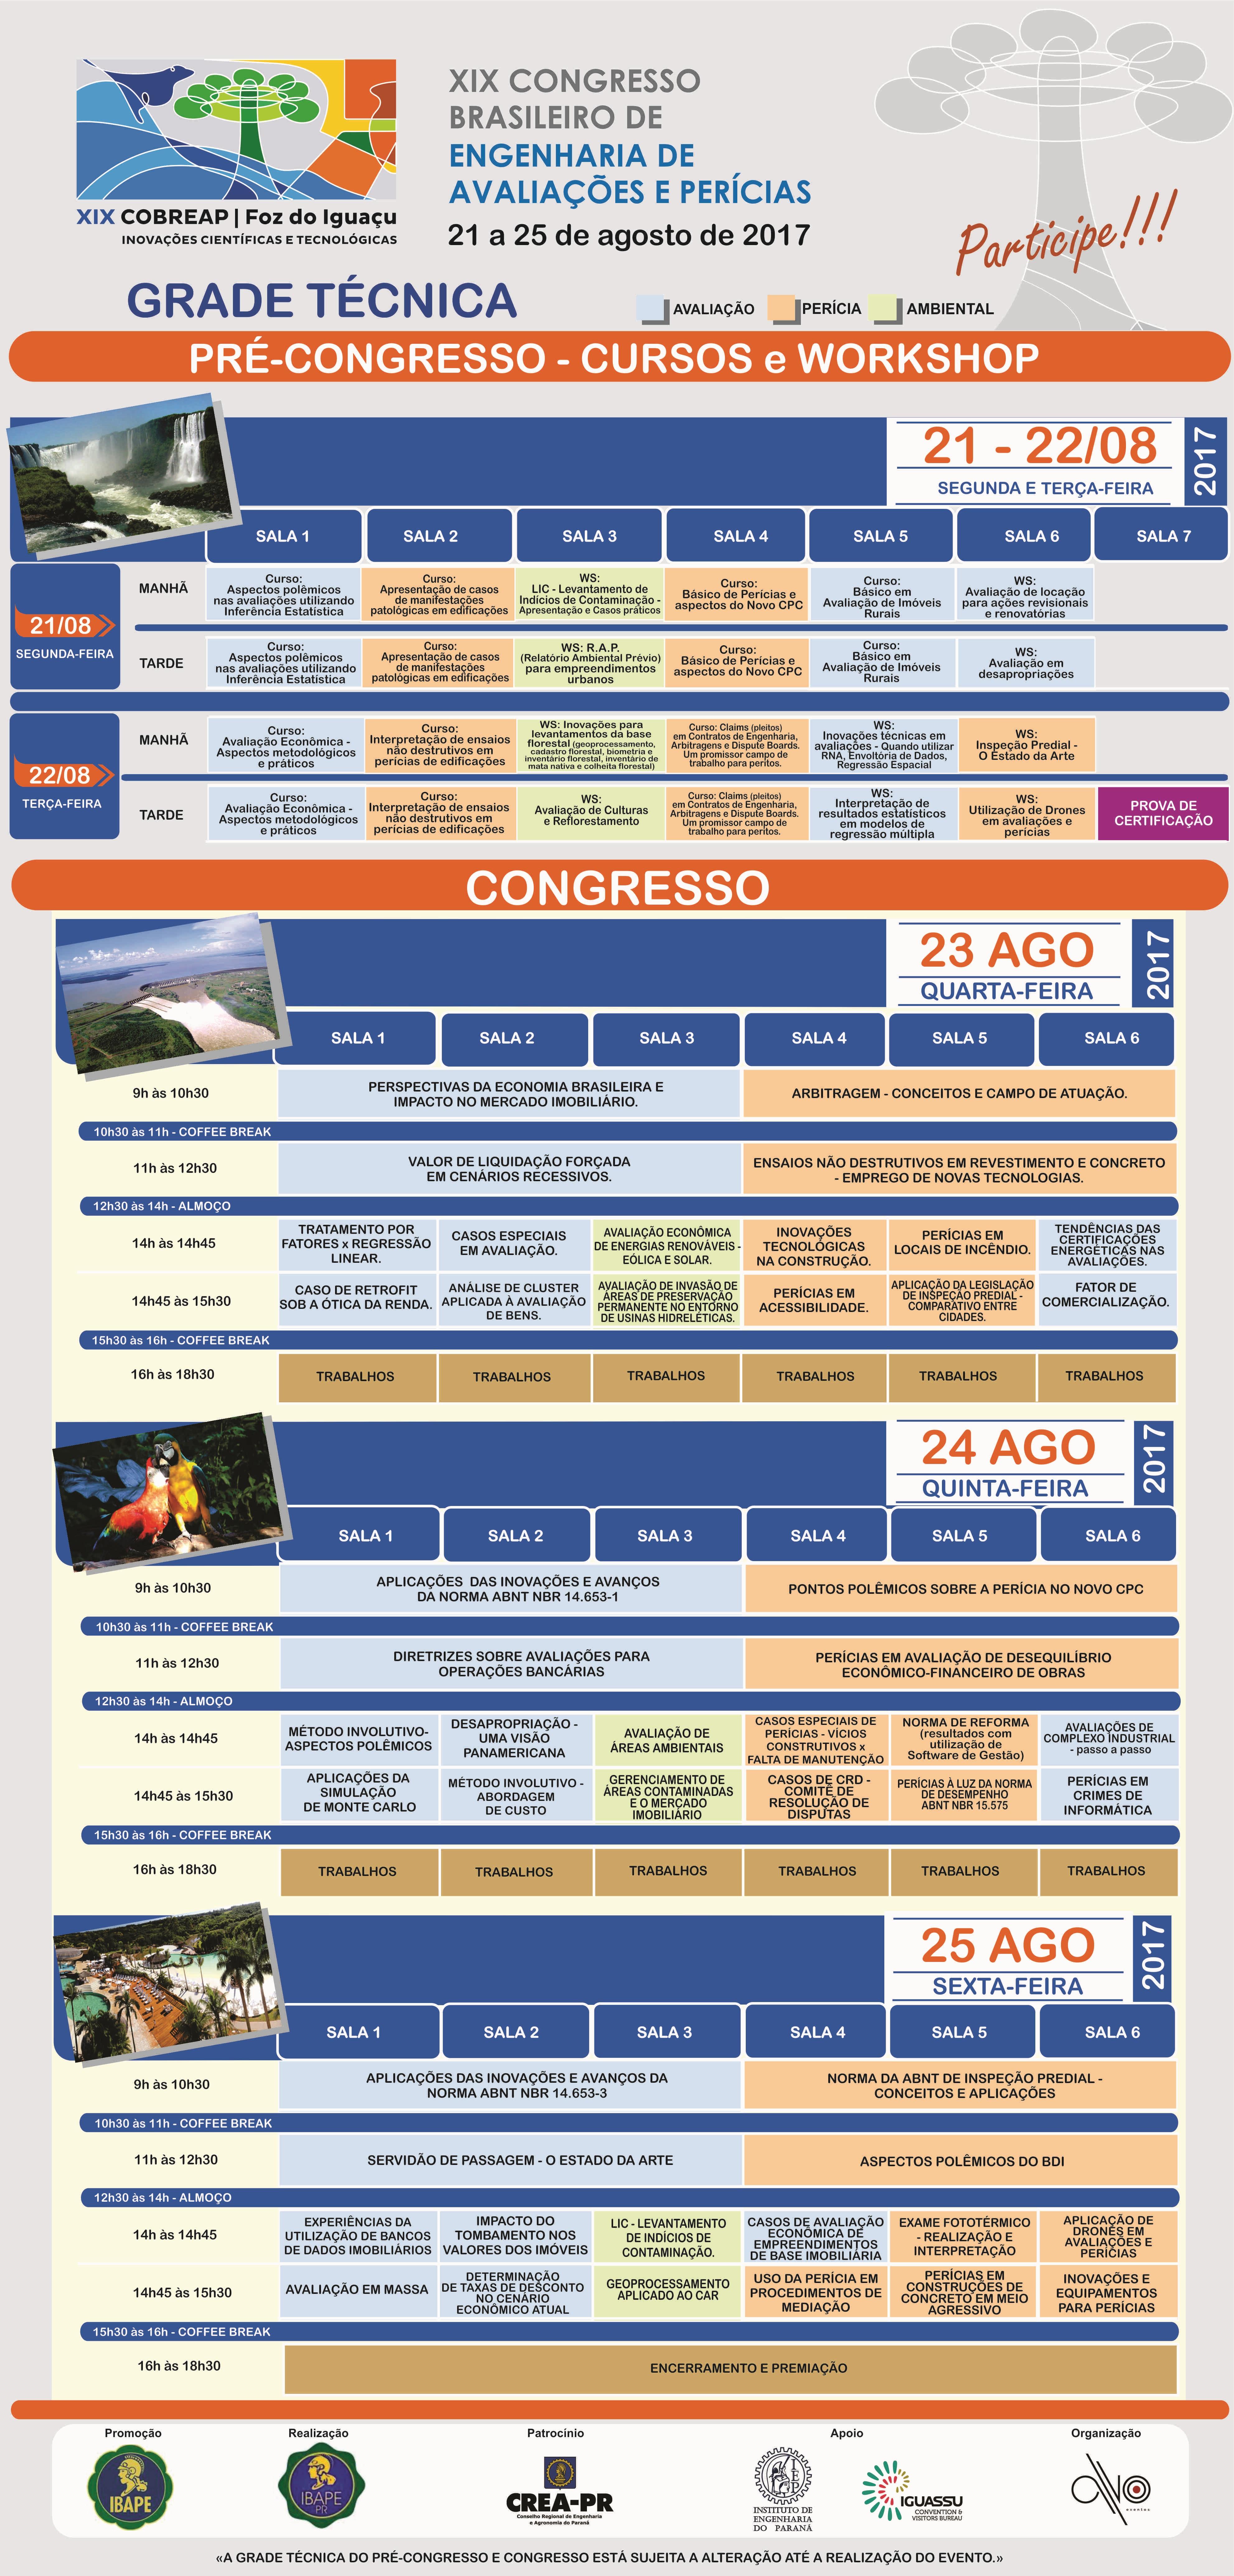 COBREAP - Grade Tecnica Congresso e Pre Congresso